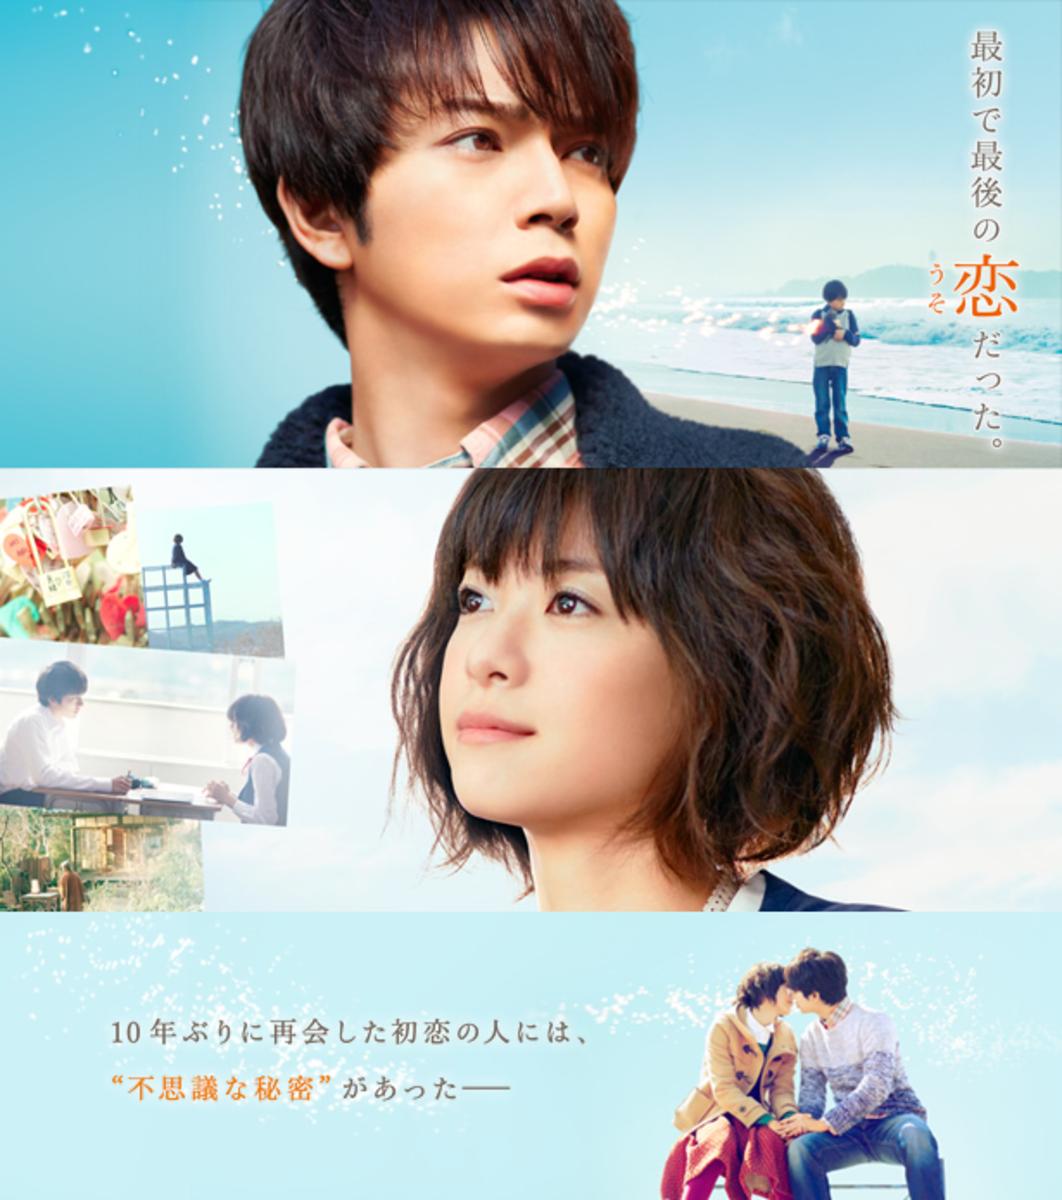 20-most-heartbreaking-japanese-films-part-2